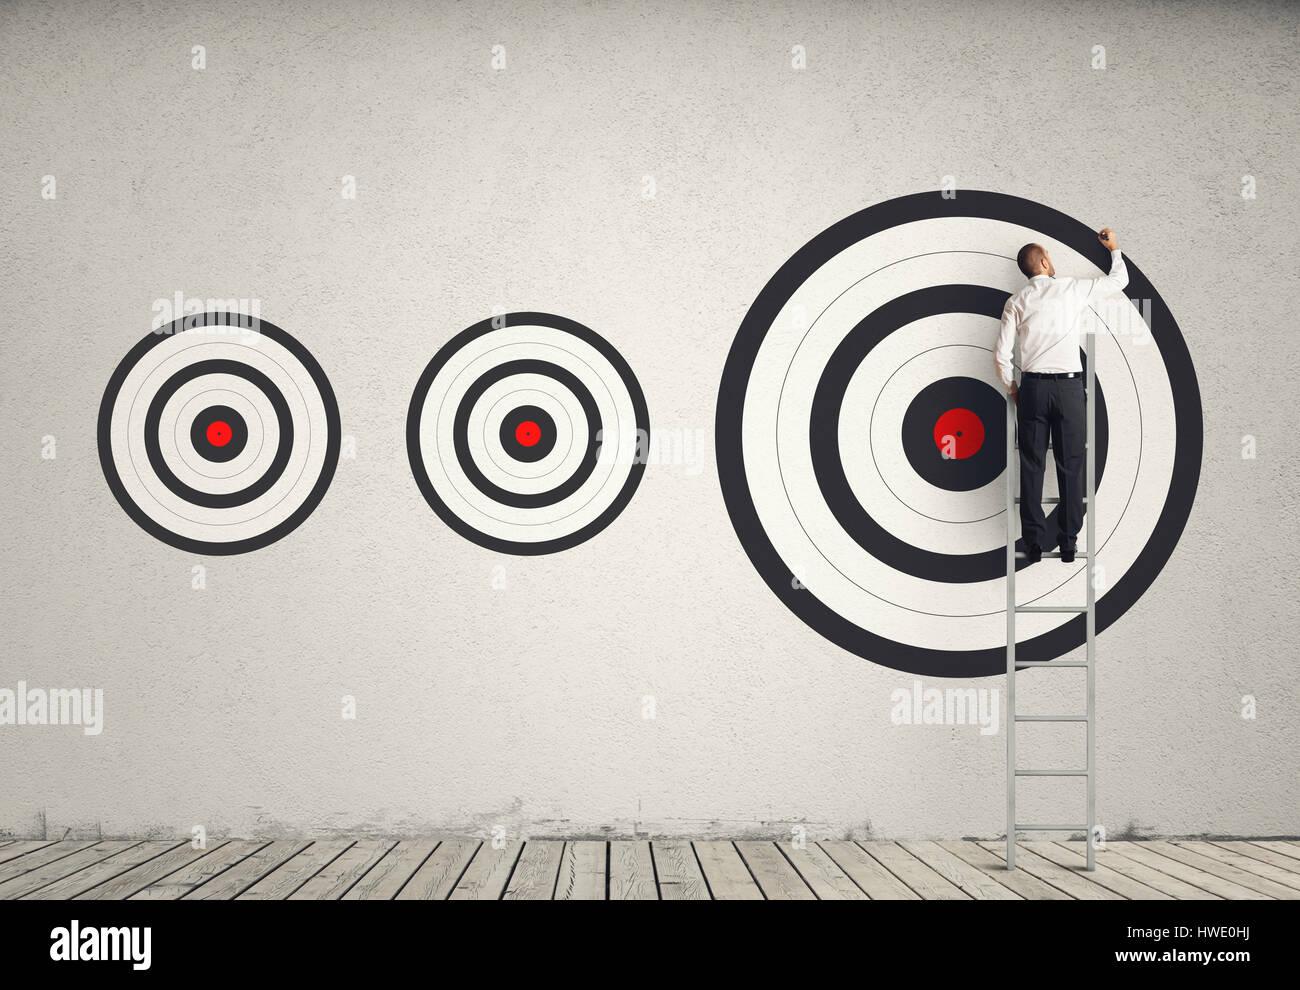 Hitting bigger business target - Stock Image